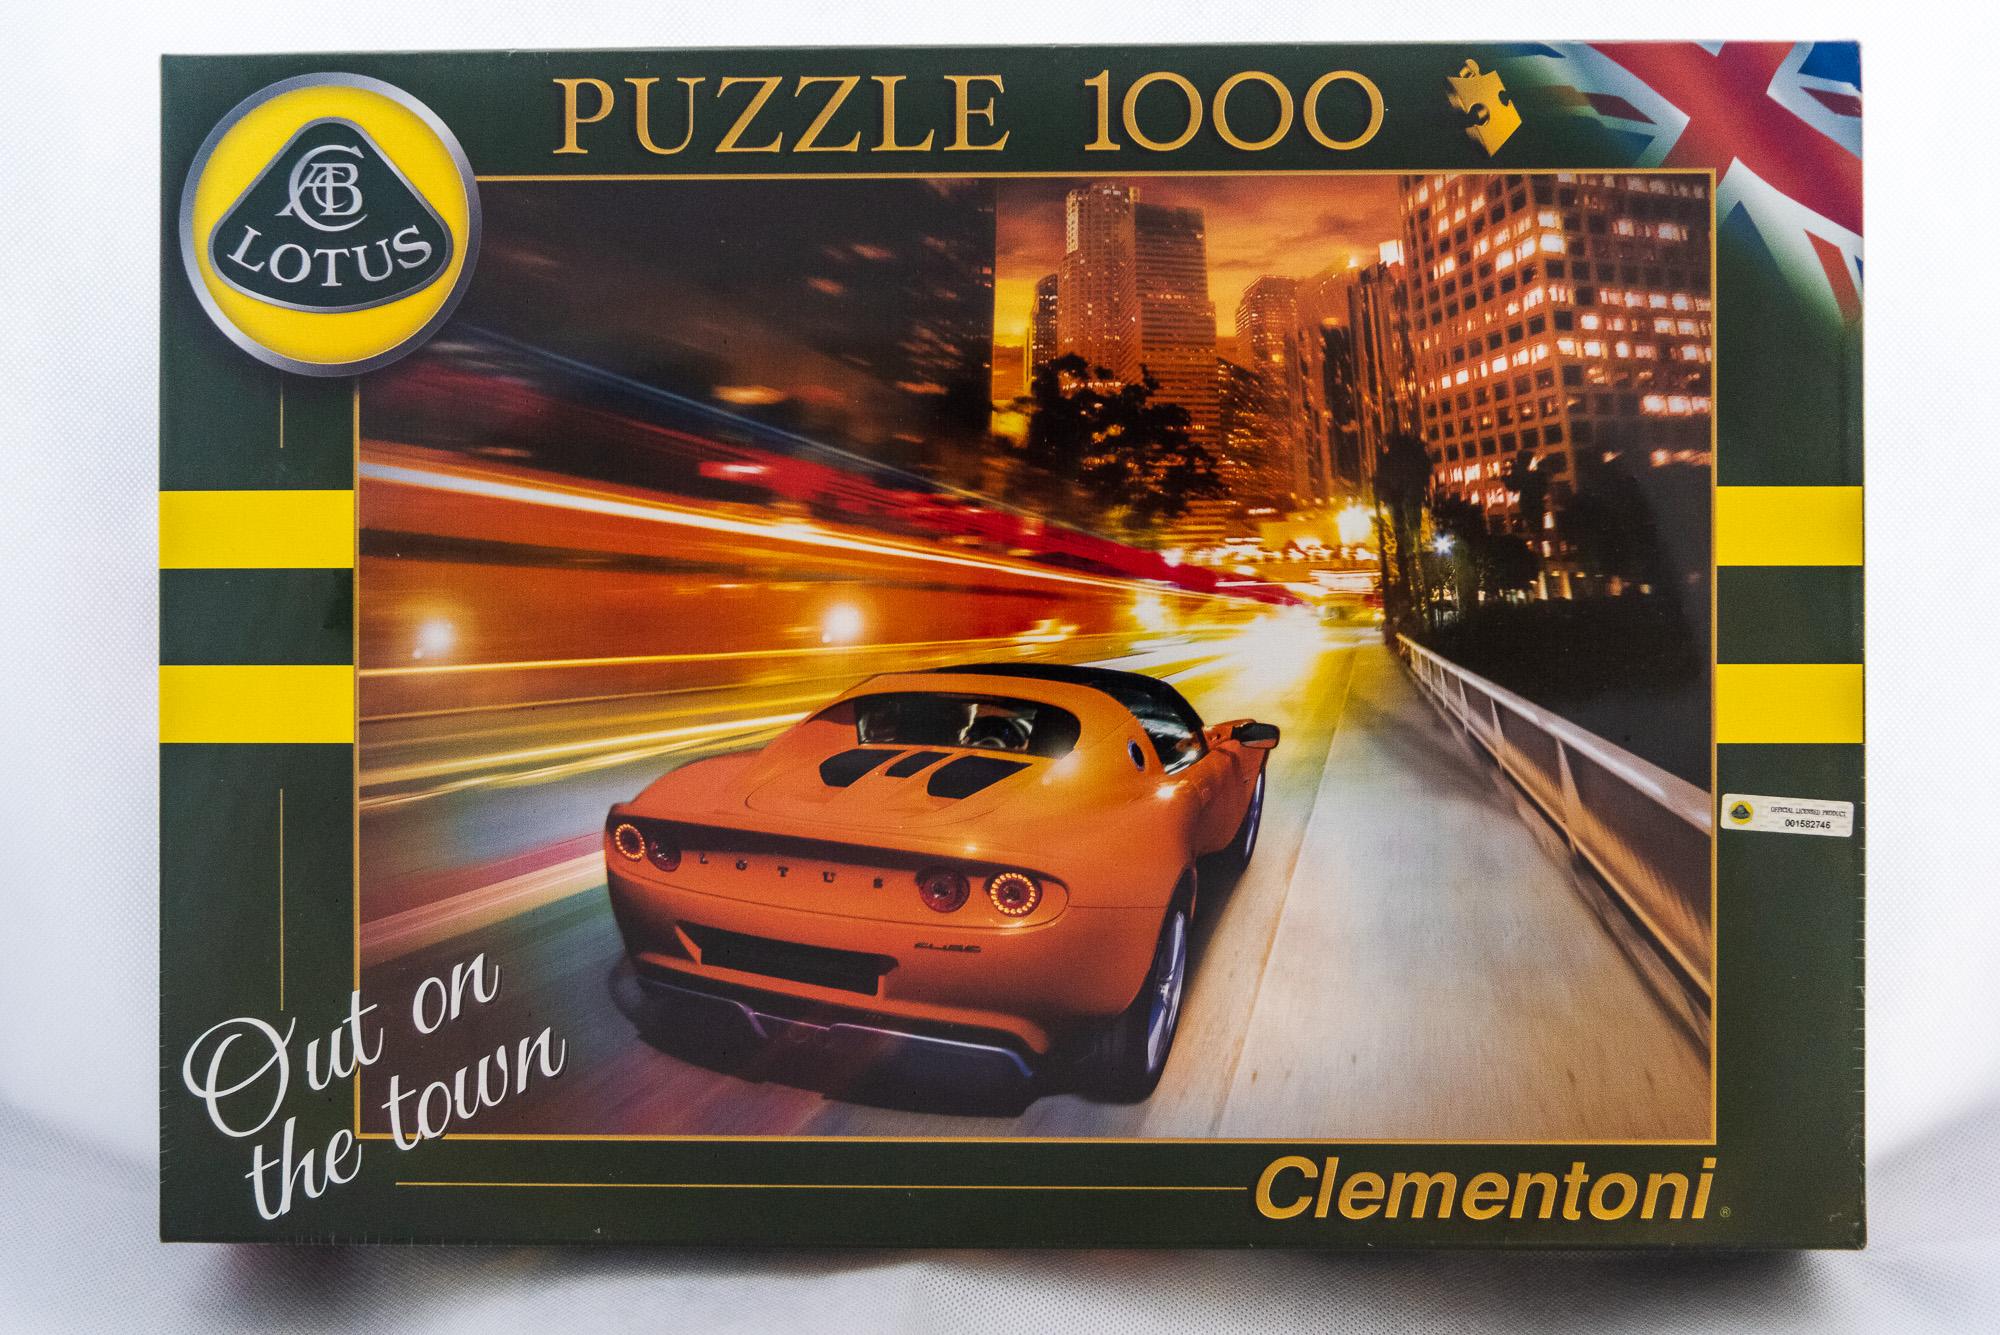 http://novalotus.ksmdomain.net/pics/gylo19v/categories/memorabilia/05-puzzle/puzzle%2020200525-DSC_0317%202000sh.jpg